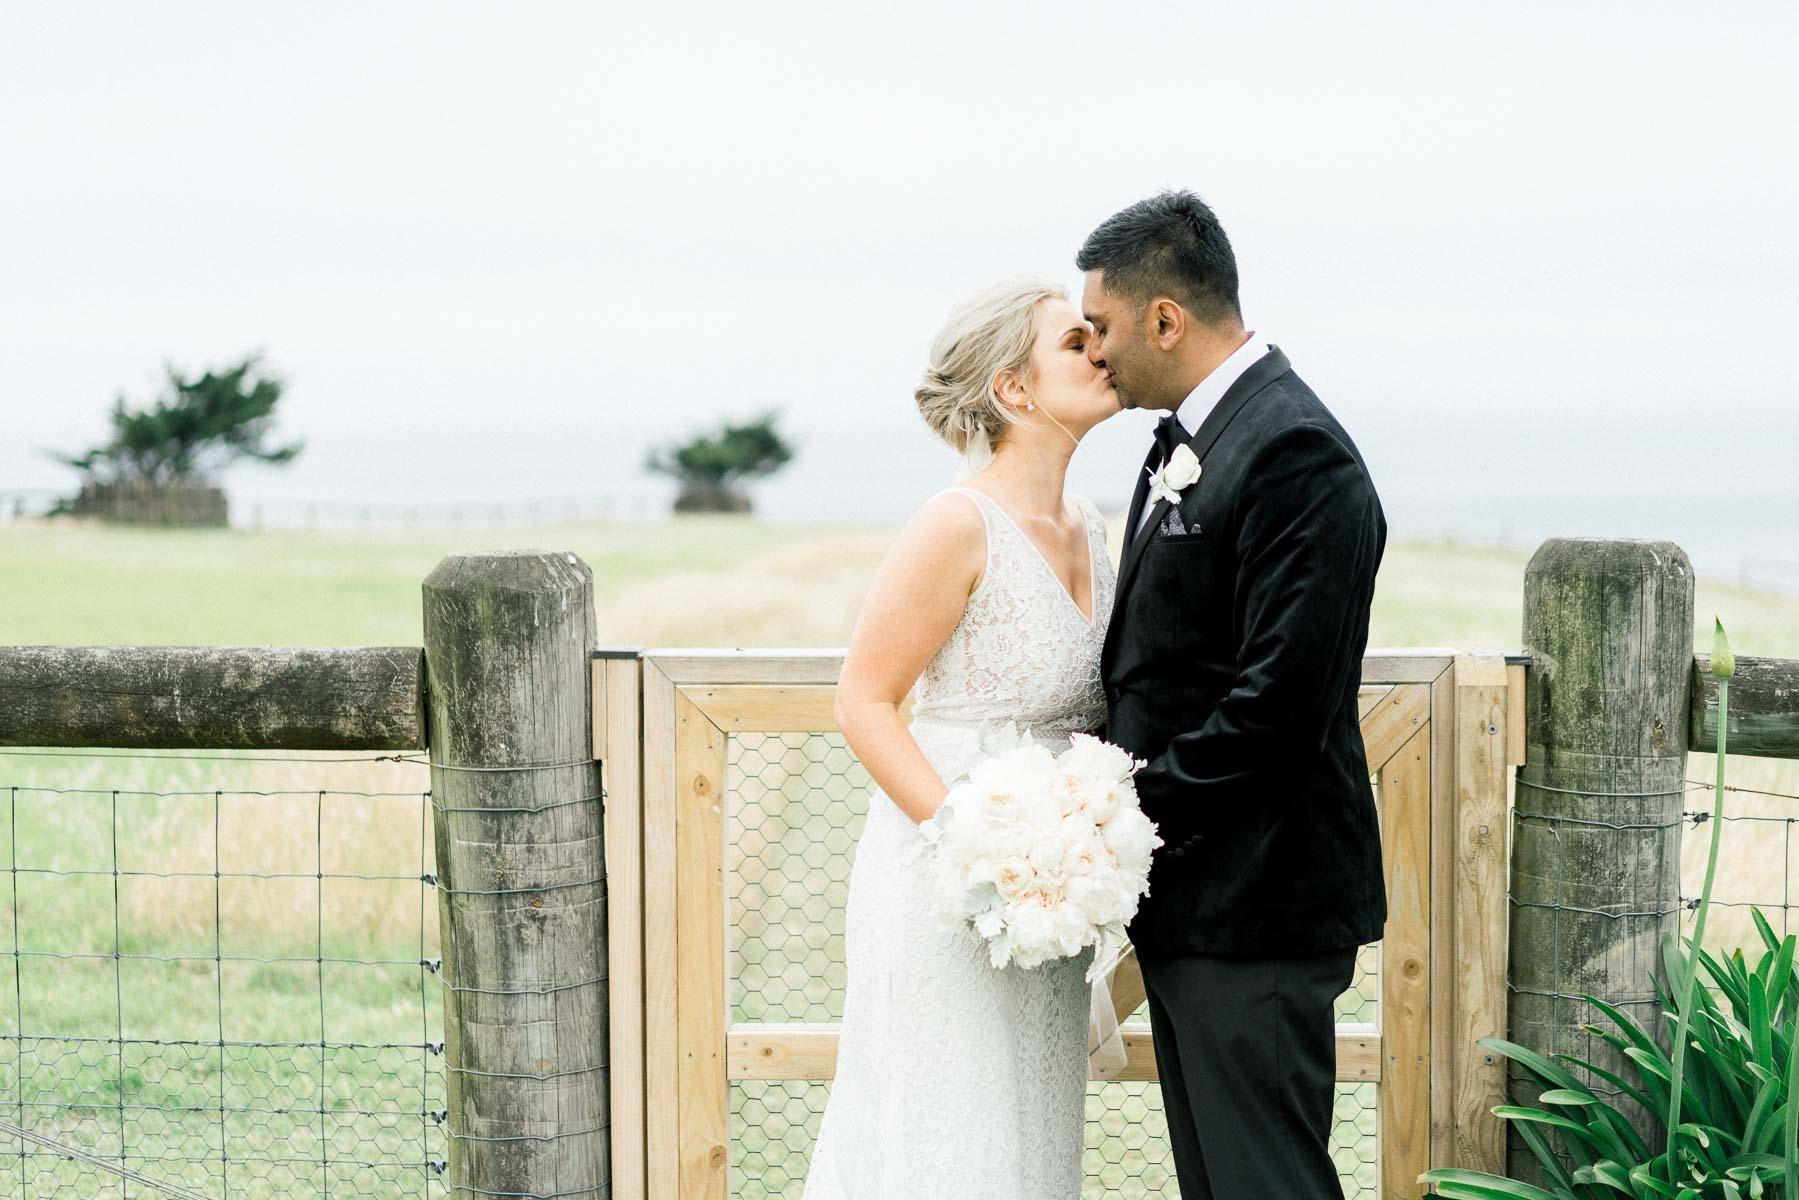 trenavin-chapel-phillip-island-wedding-heart+soul-weddings-sally-sean-01351.jpg